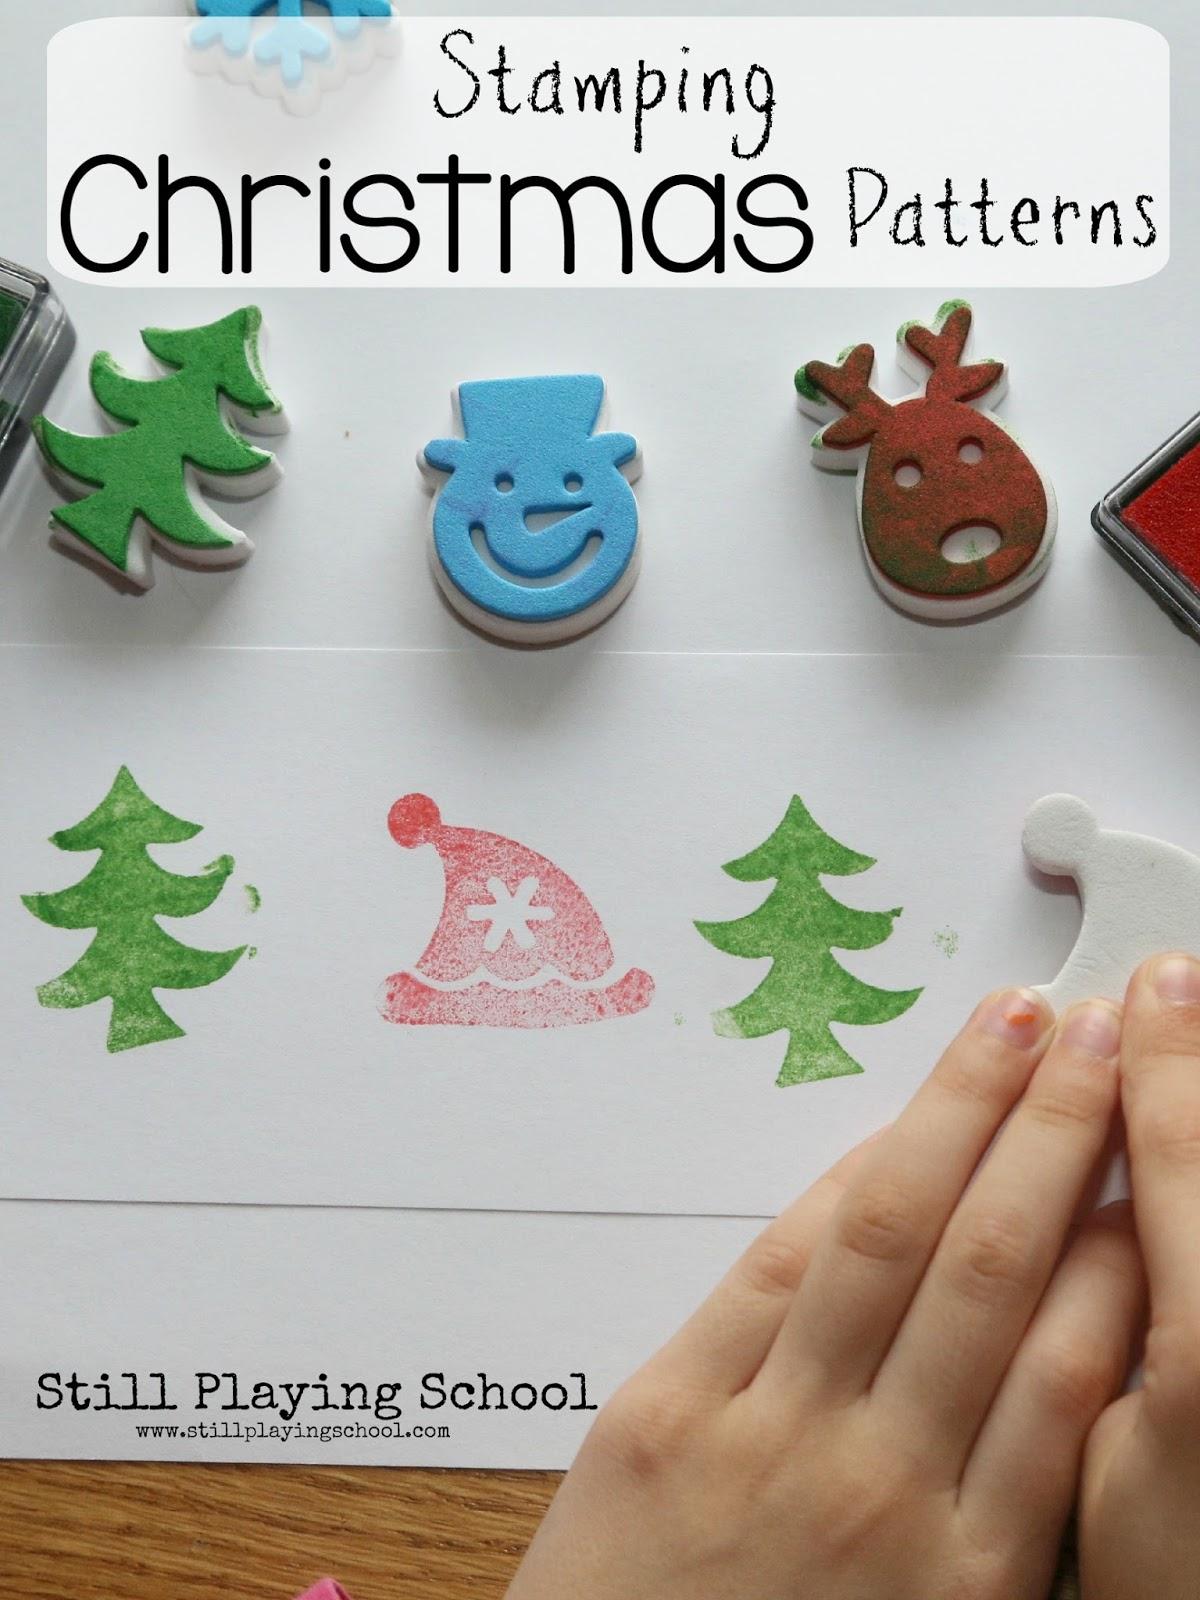 Stamping Christmas Patterns